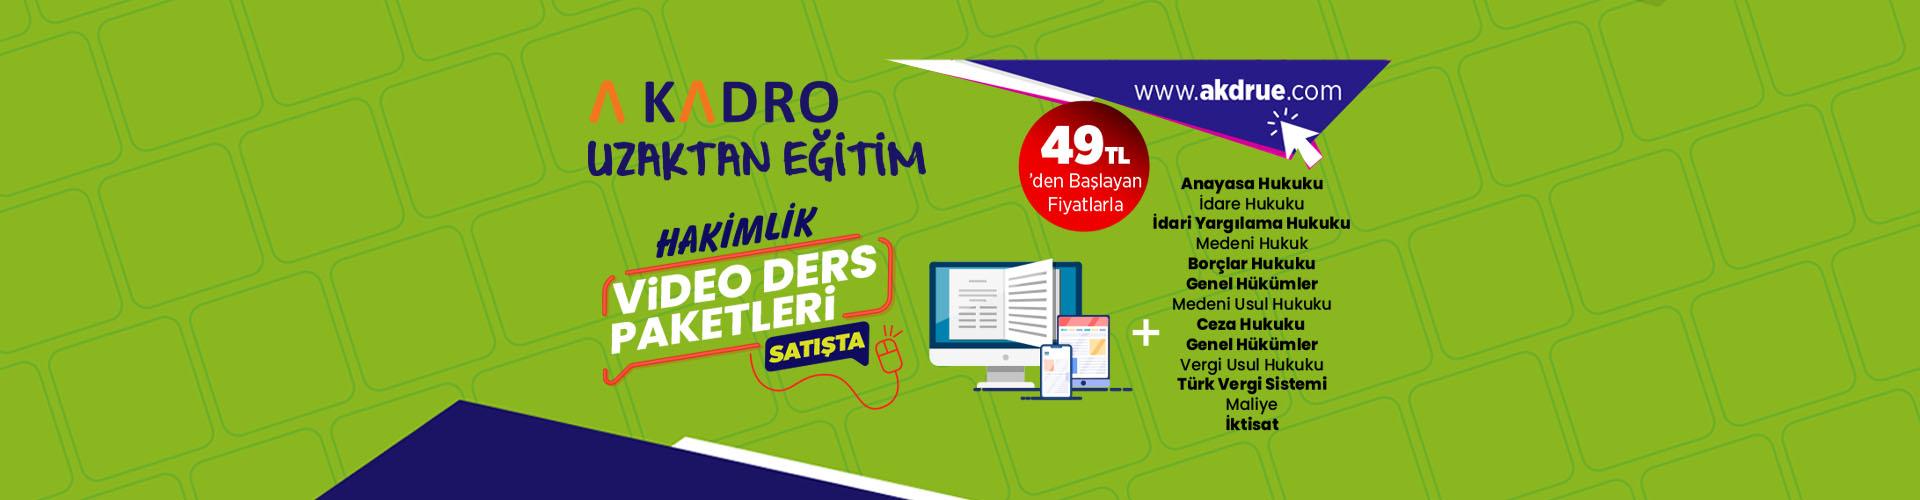 HAKİMLİK VİDEO DERS egitim banner